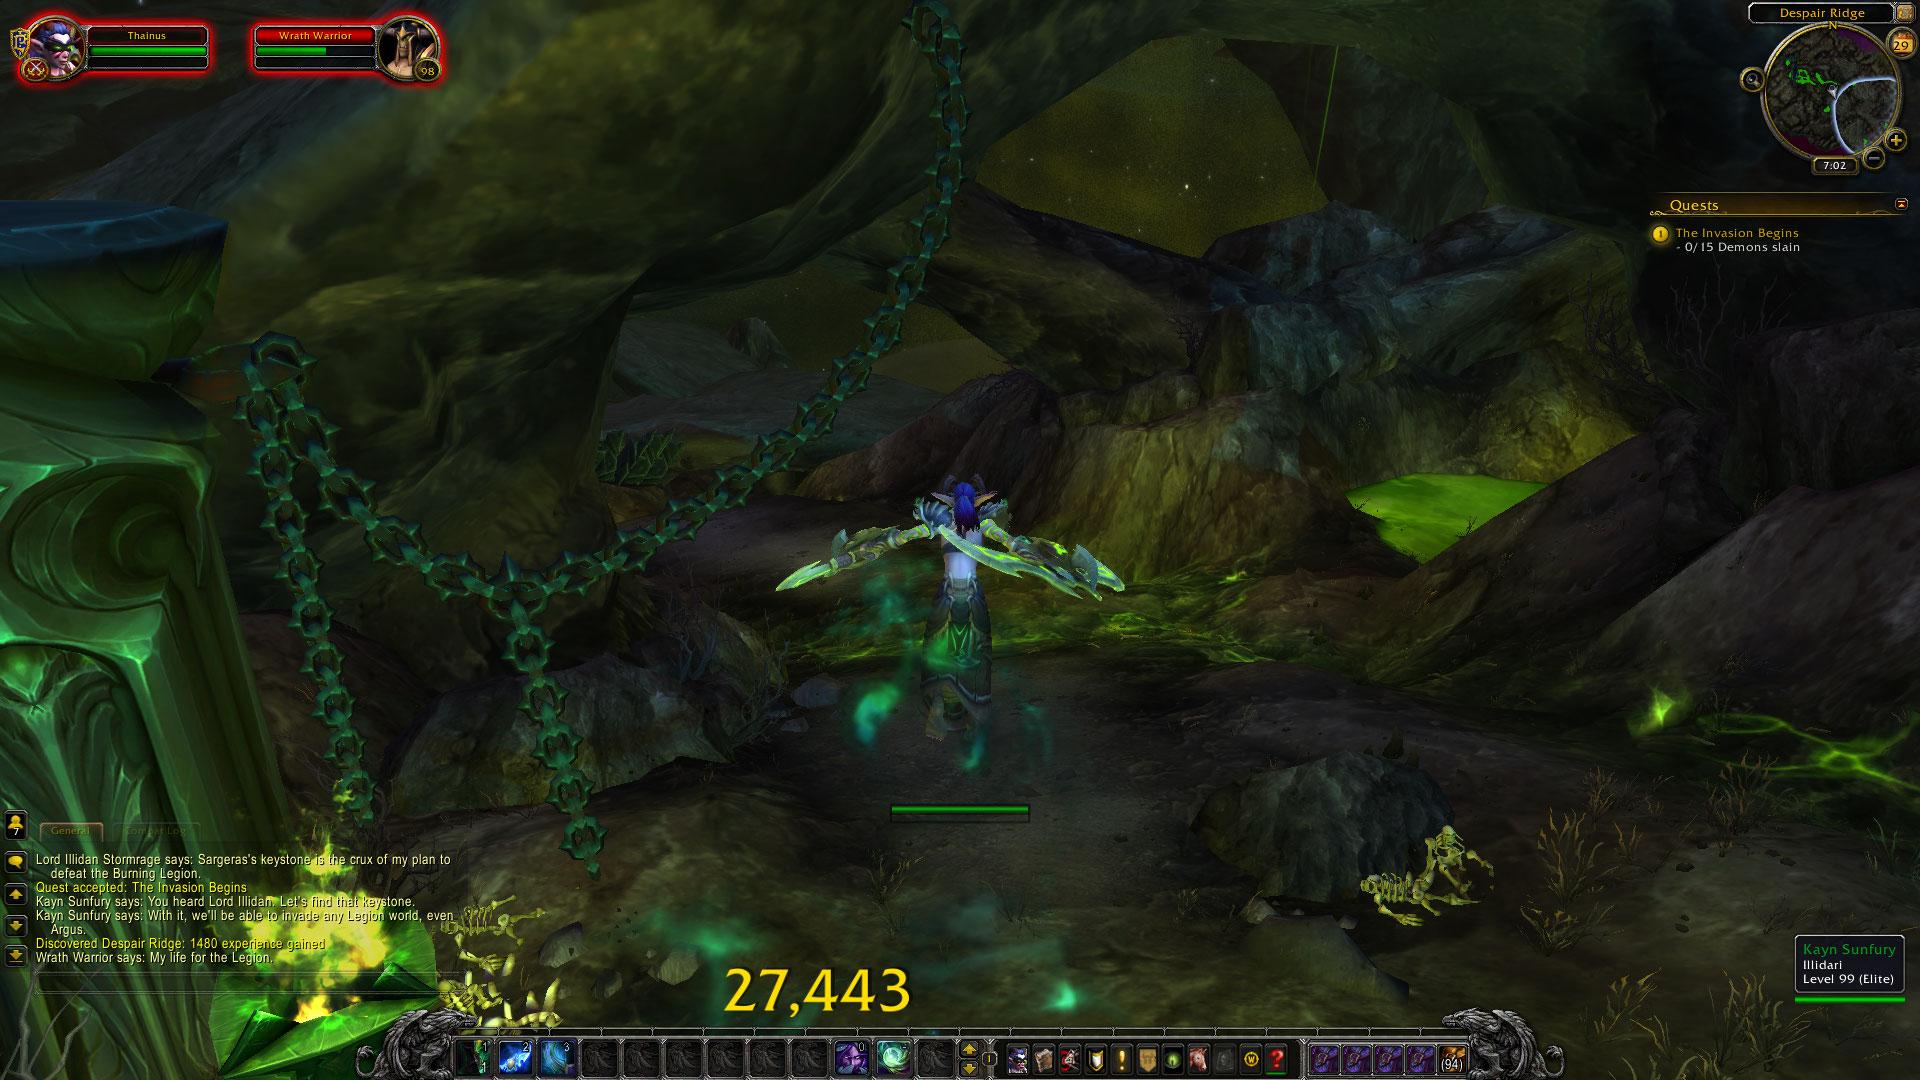 World of Warcraft: Legion fotoseriál - Plamenná legie přichází 129825